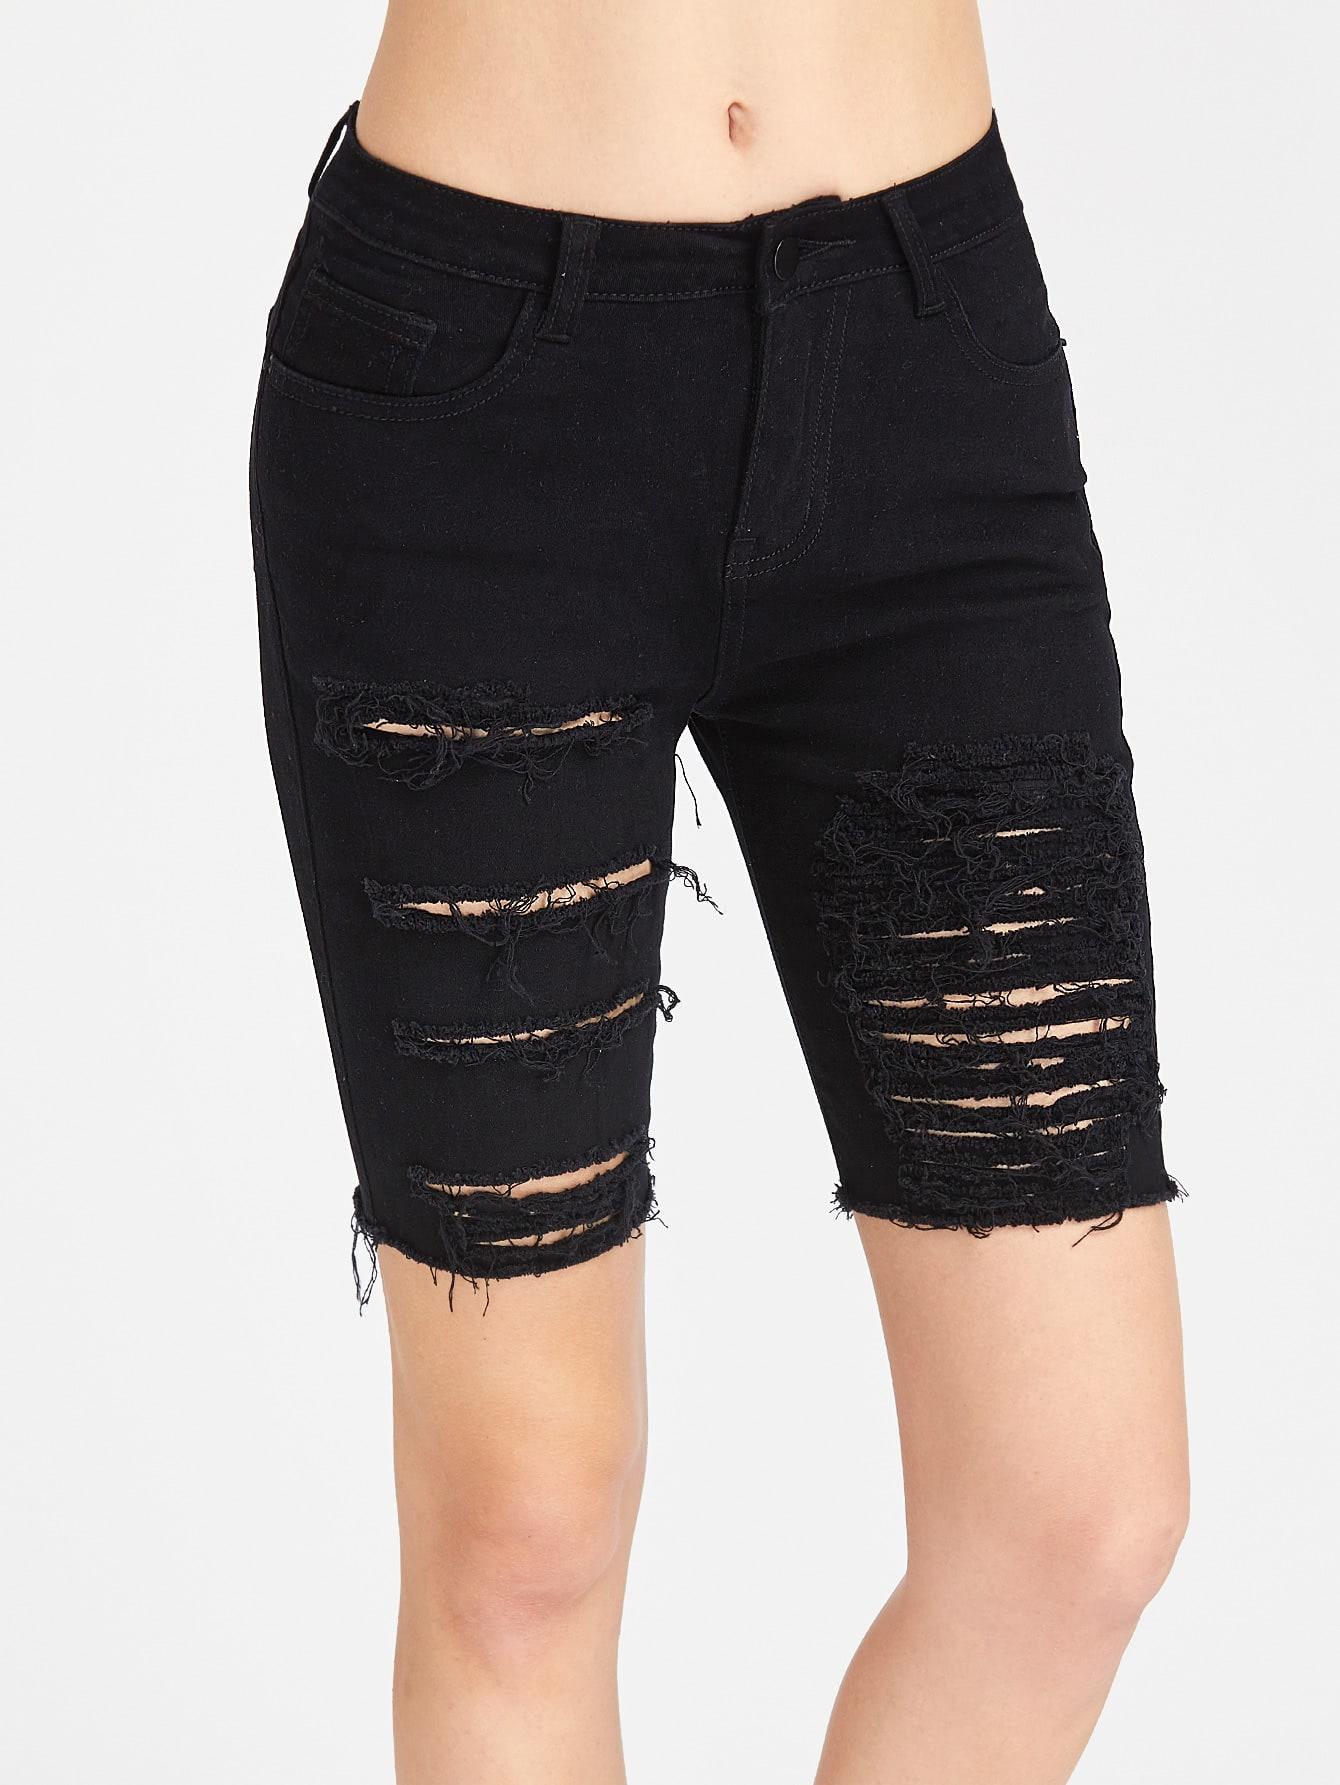 Thigh Length Ripped Skinny Denim Shorts -SheIn(Sheinside)